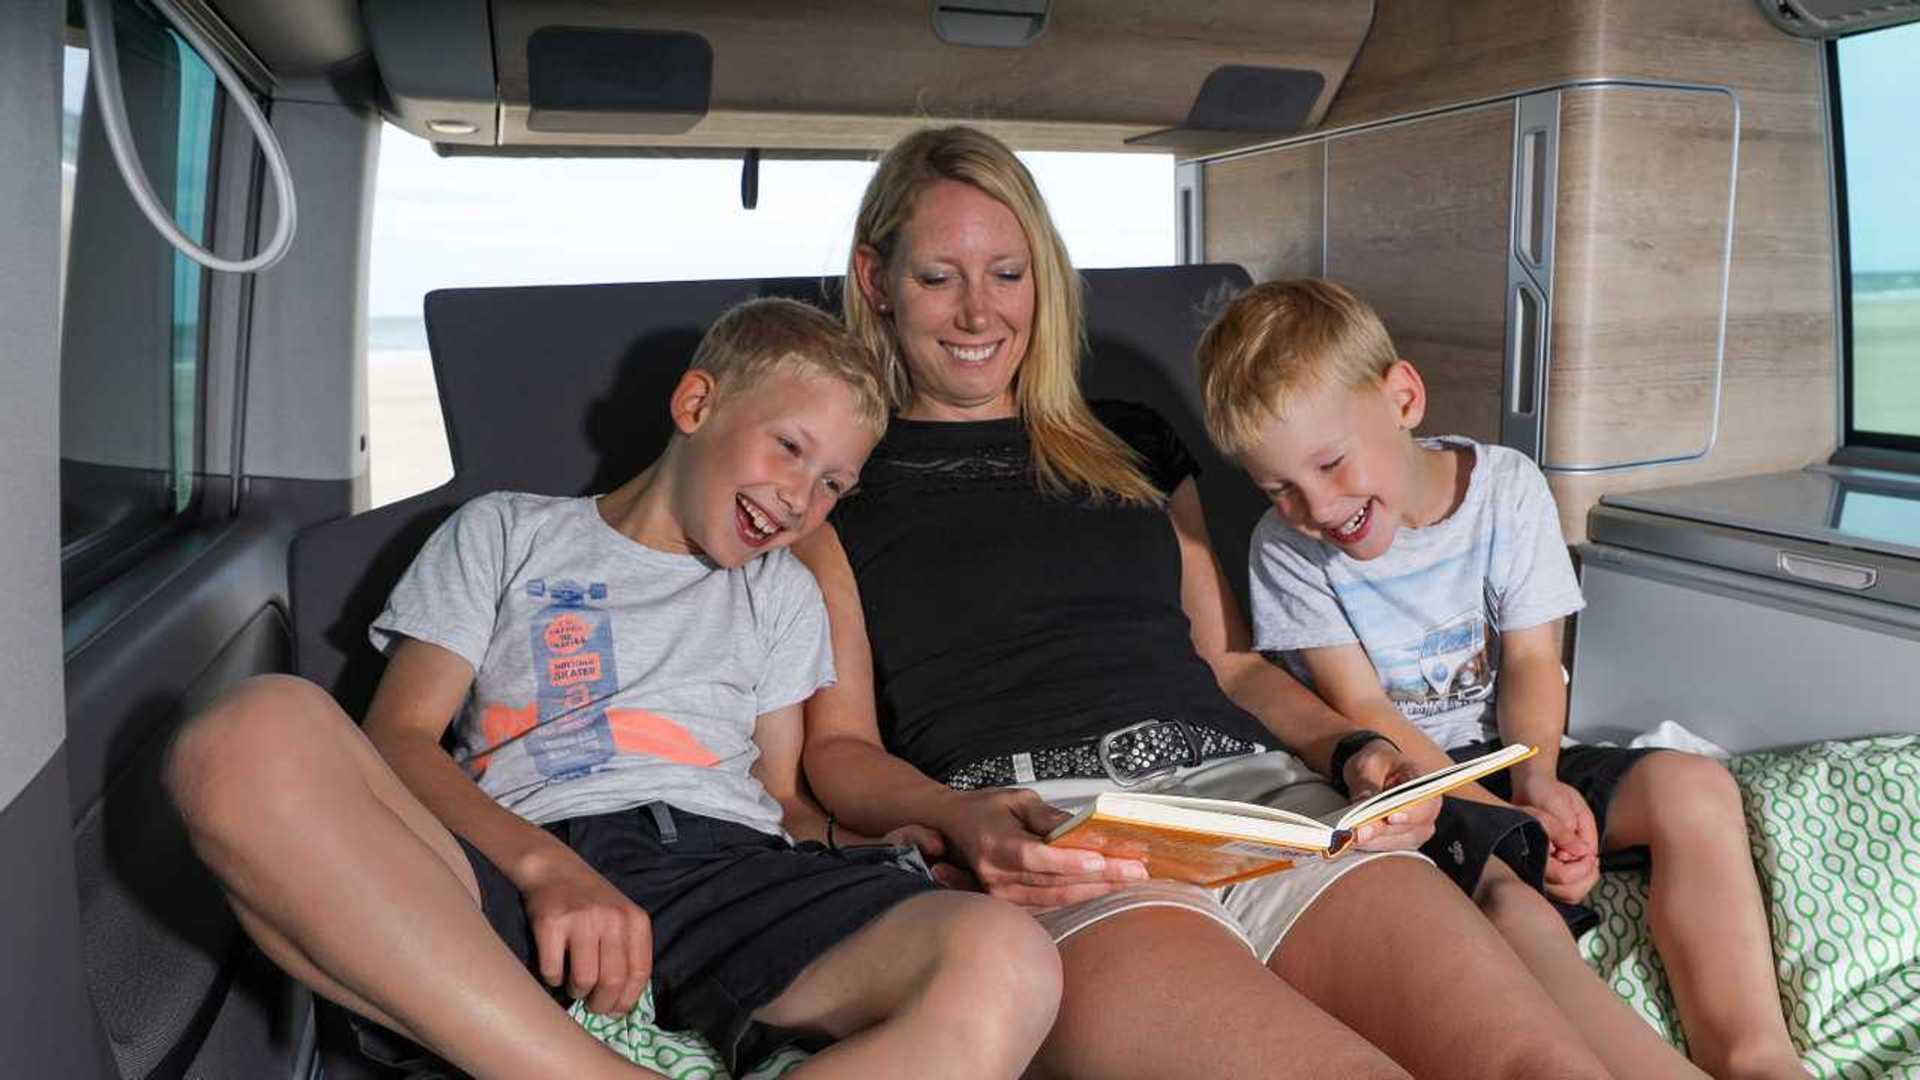 VOLKSWAGEN TRANSPORTER SEAT COVERS 2+1 BRAND NEW